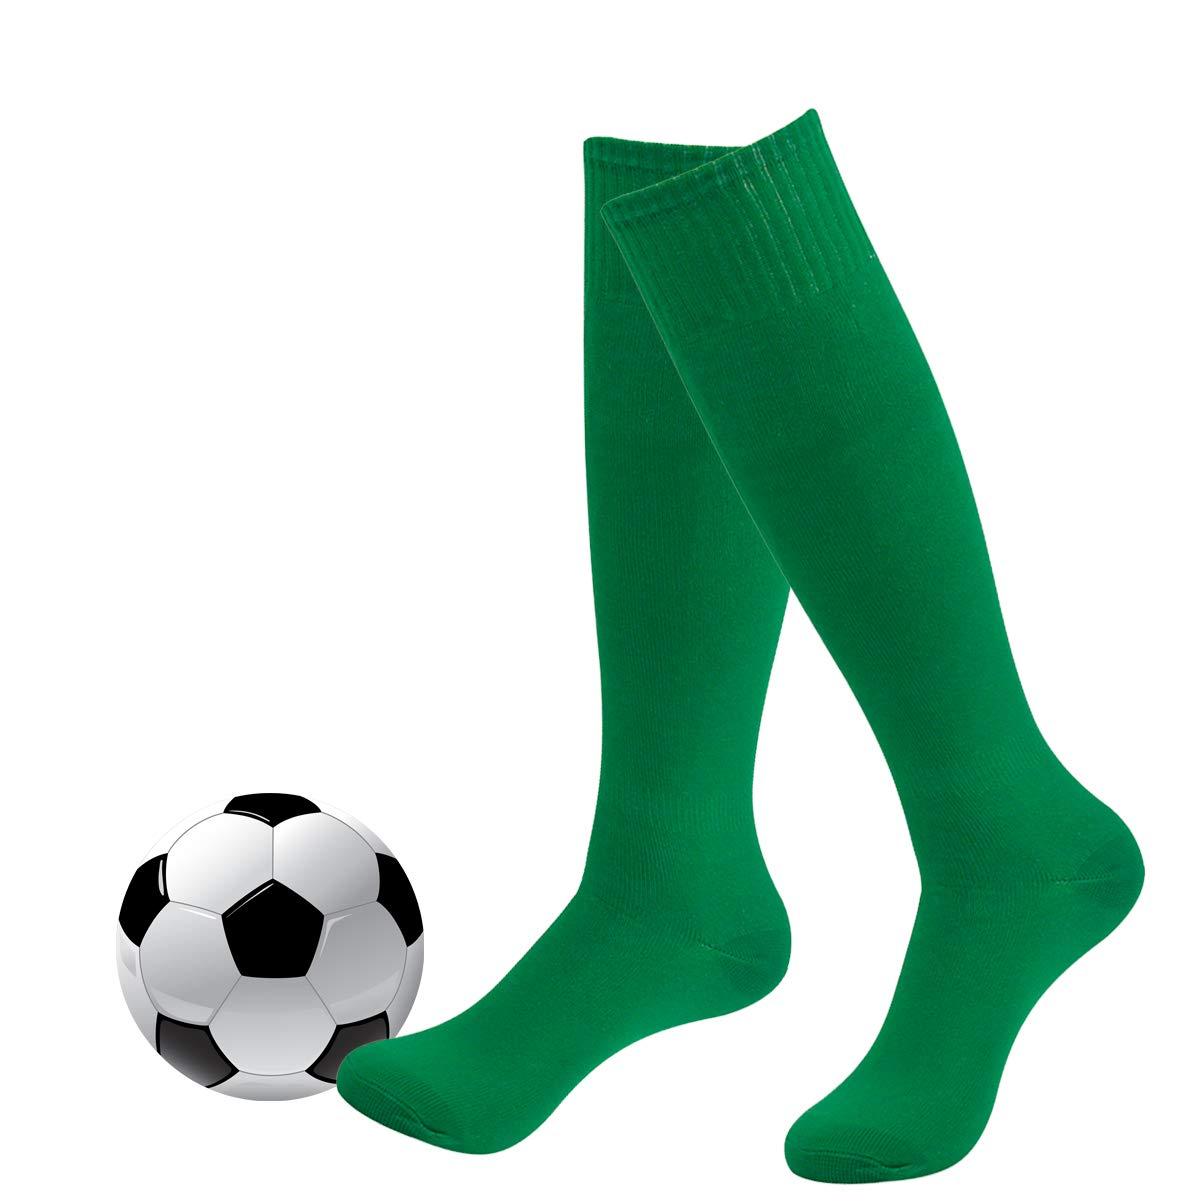 Football Socks,Fasoar Men's Women's Boys Long Softball Baseball Socks 2 Pairs Green by Fasoar